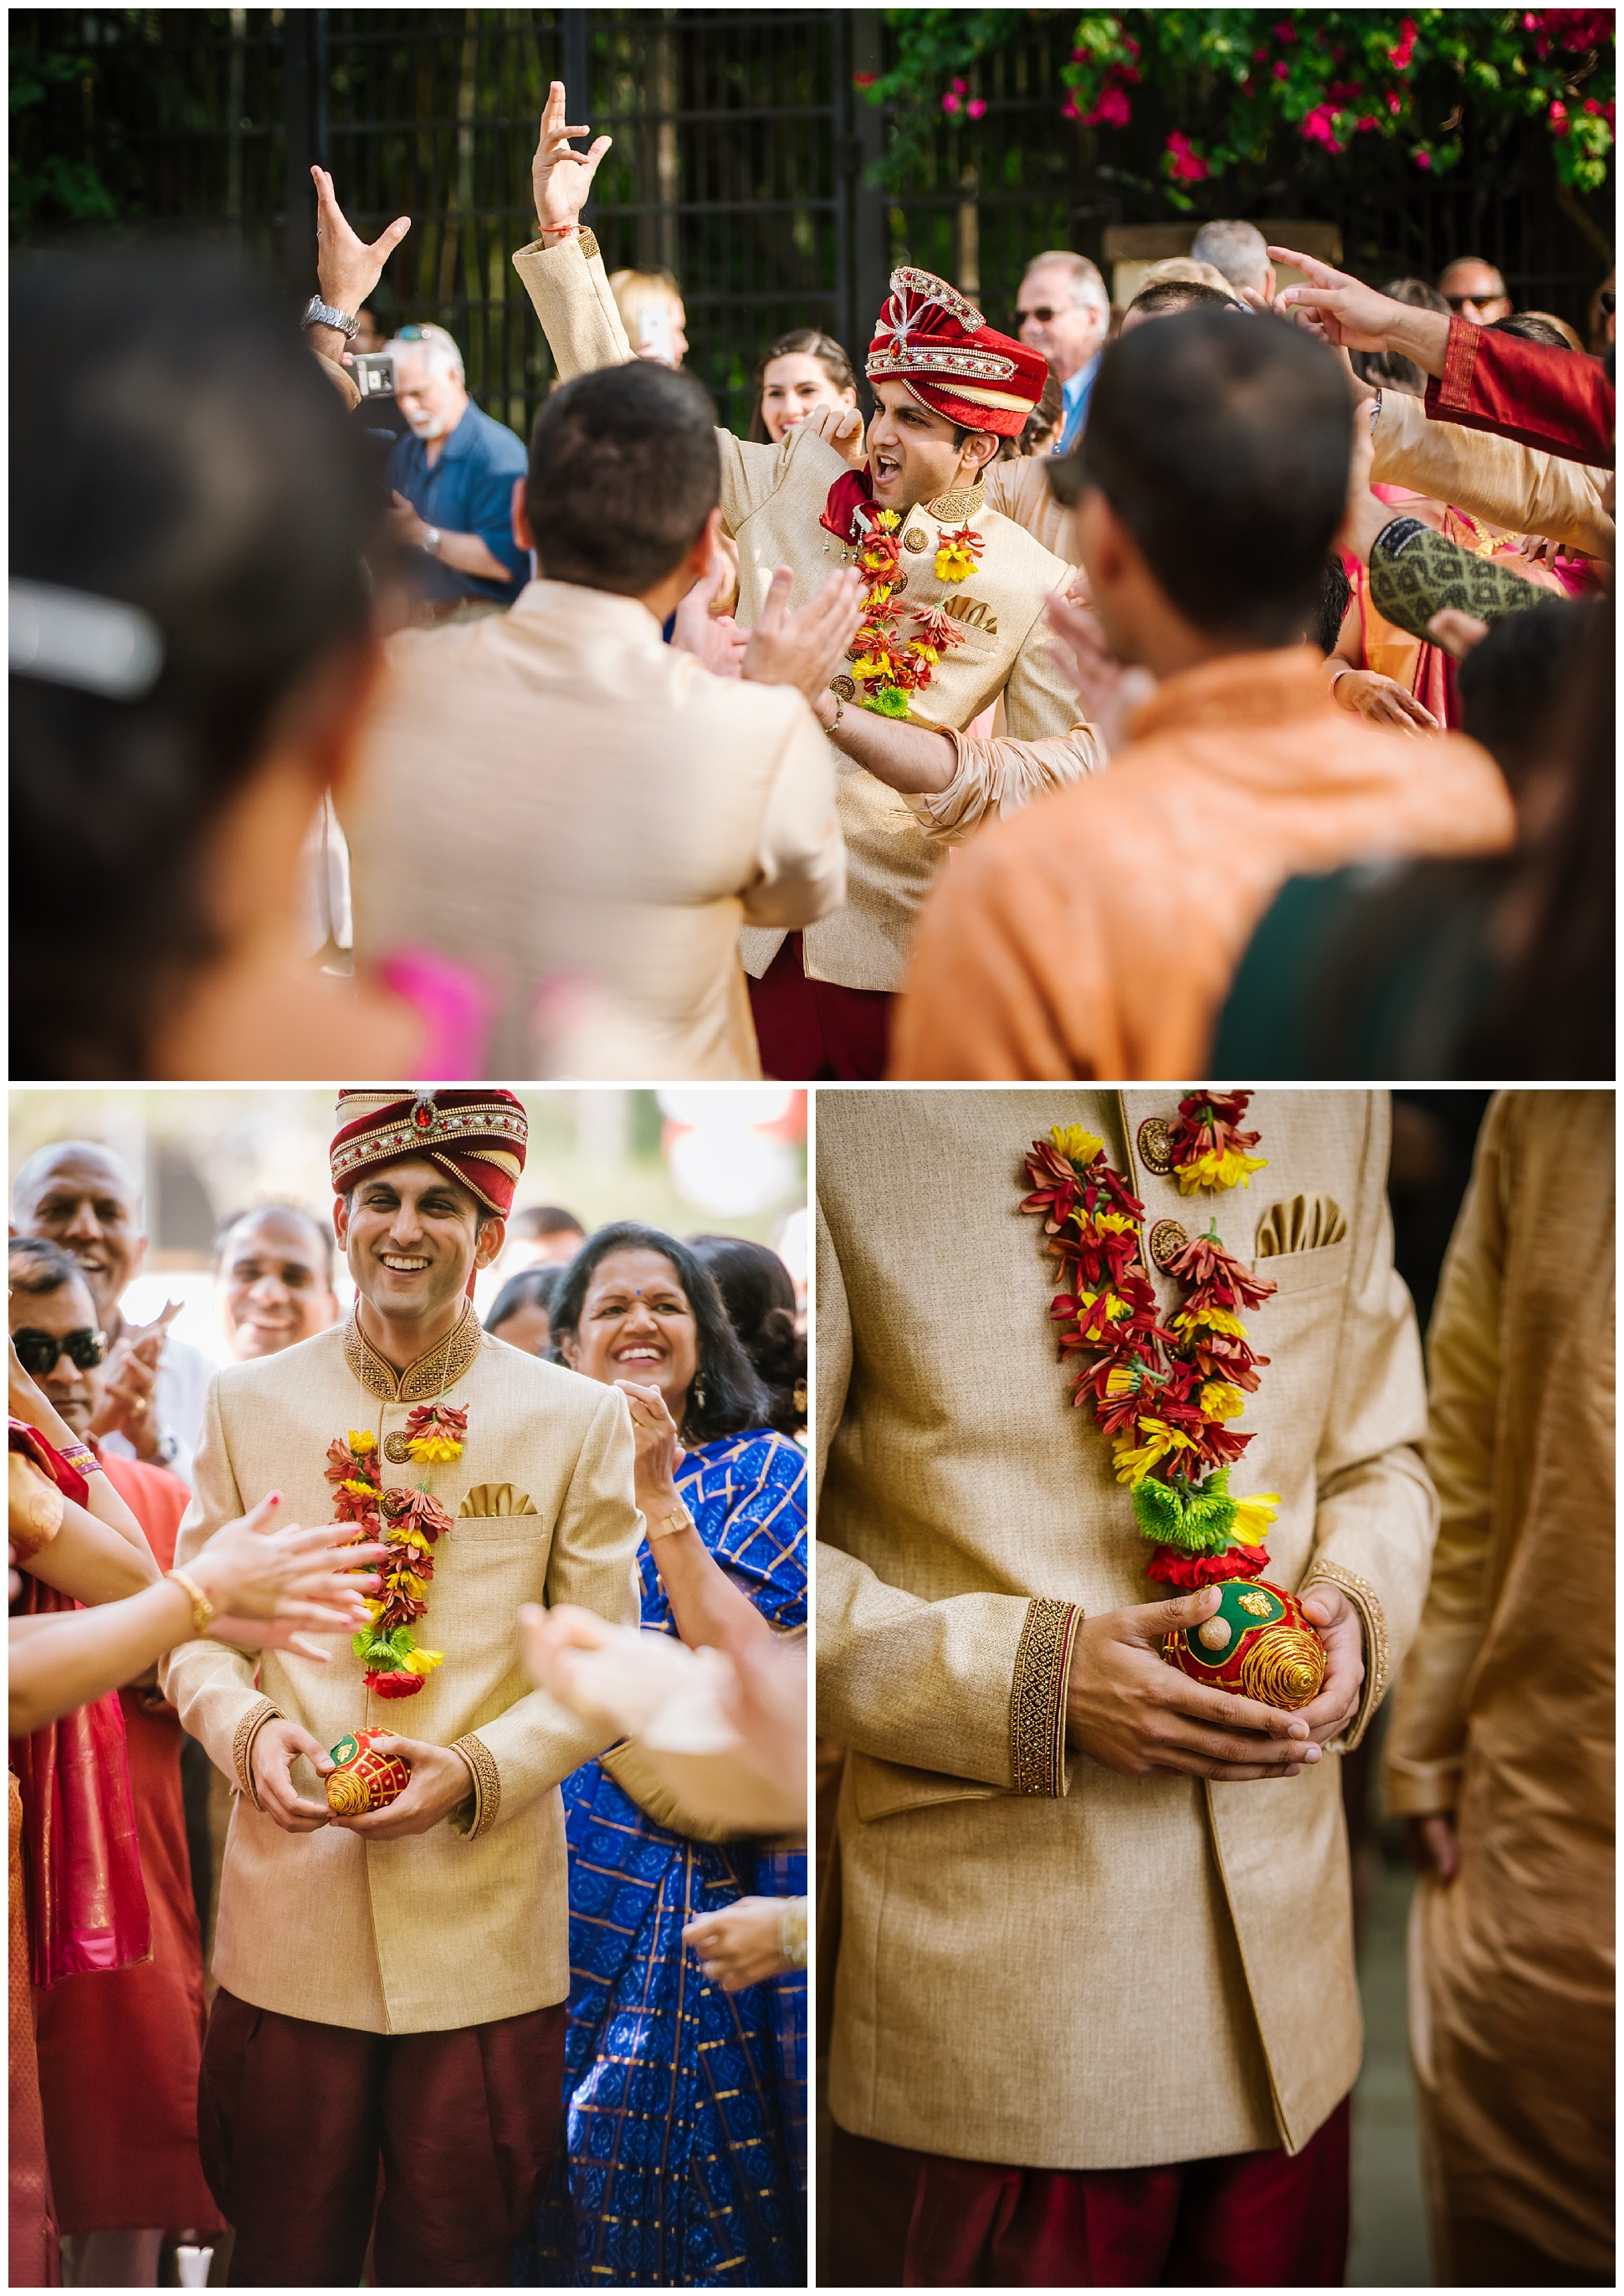 St-pete-indian-wedding-photographer-barat-sunken-gardens_0092.jpg